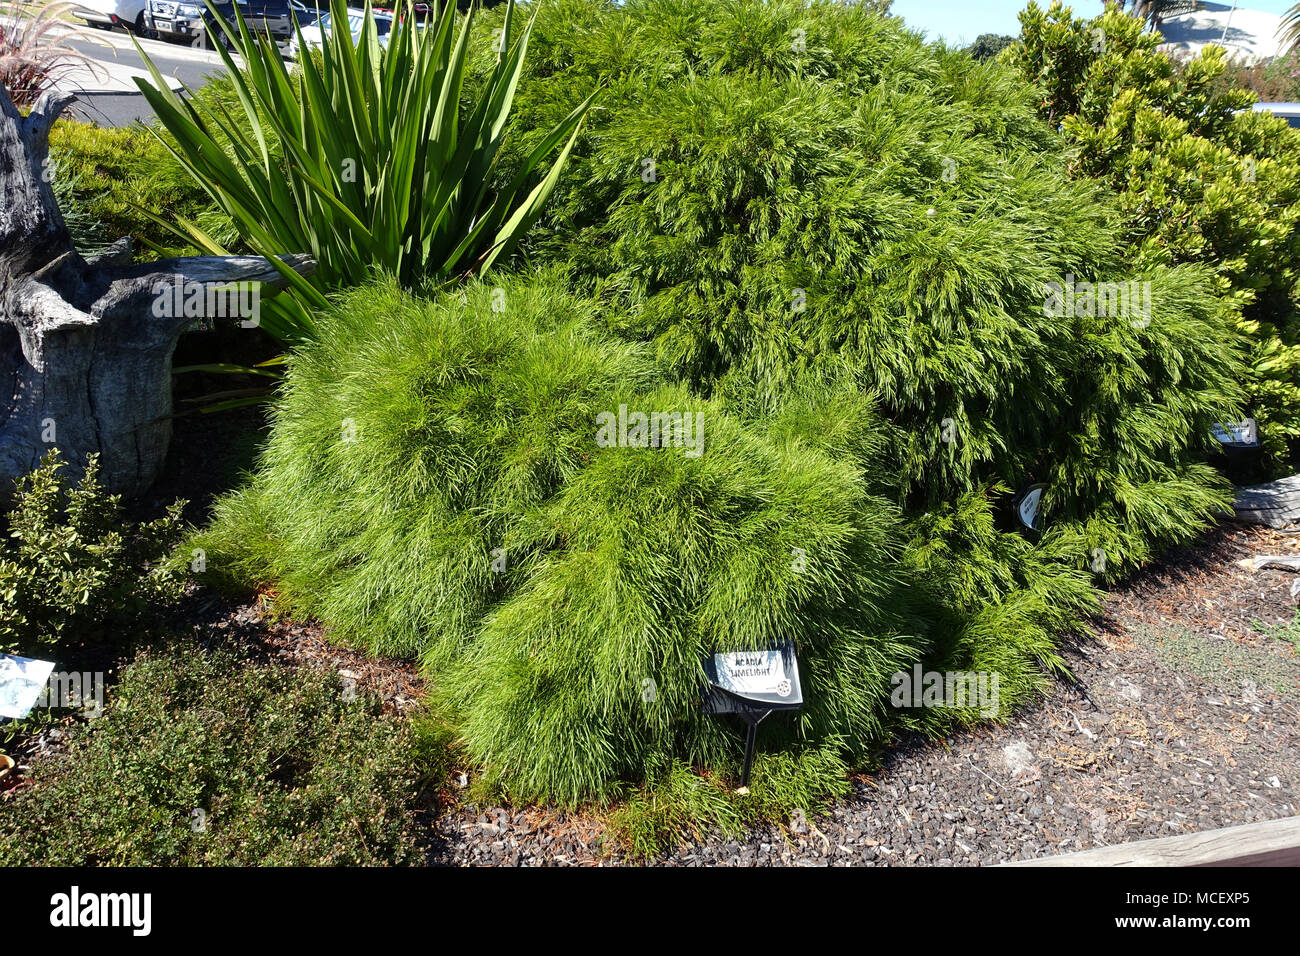 Acacia Cognata Limelight River Wattle Stock Photo 179807885 Alamy